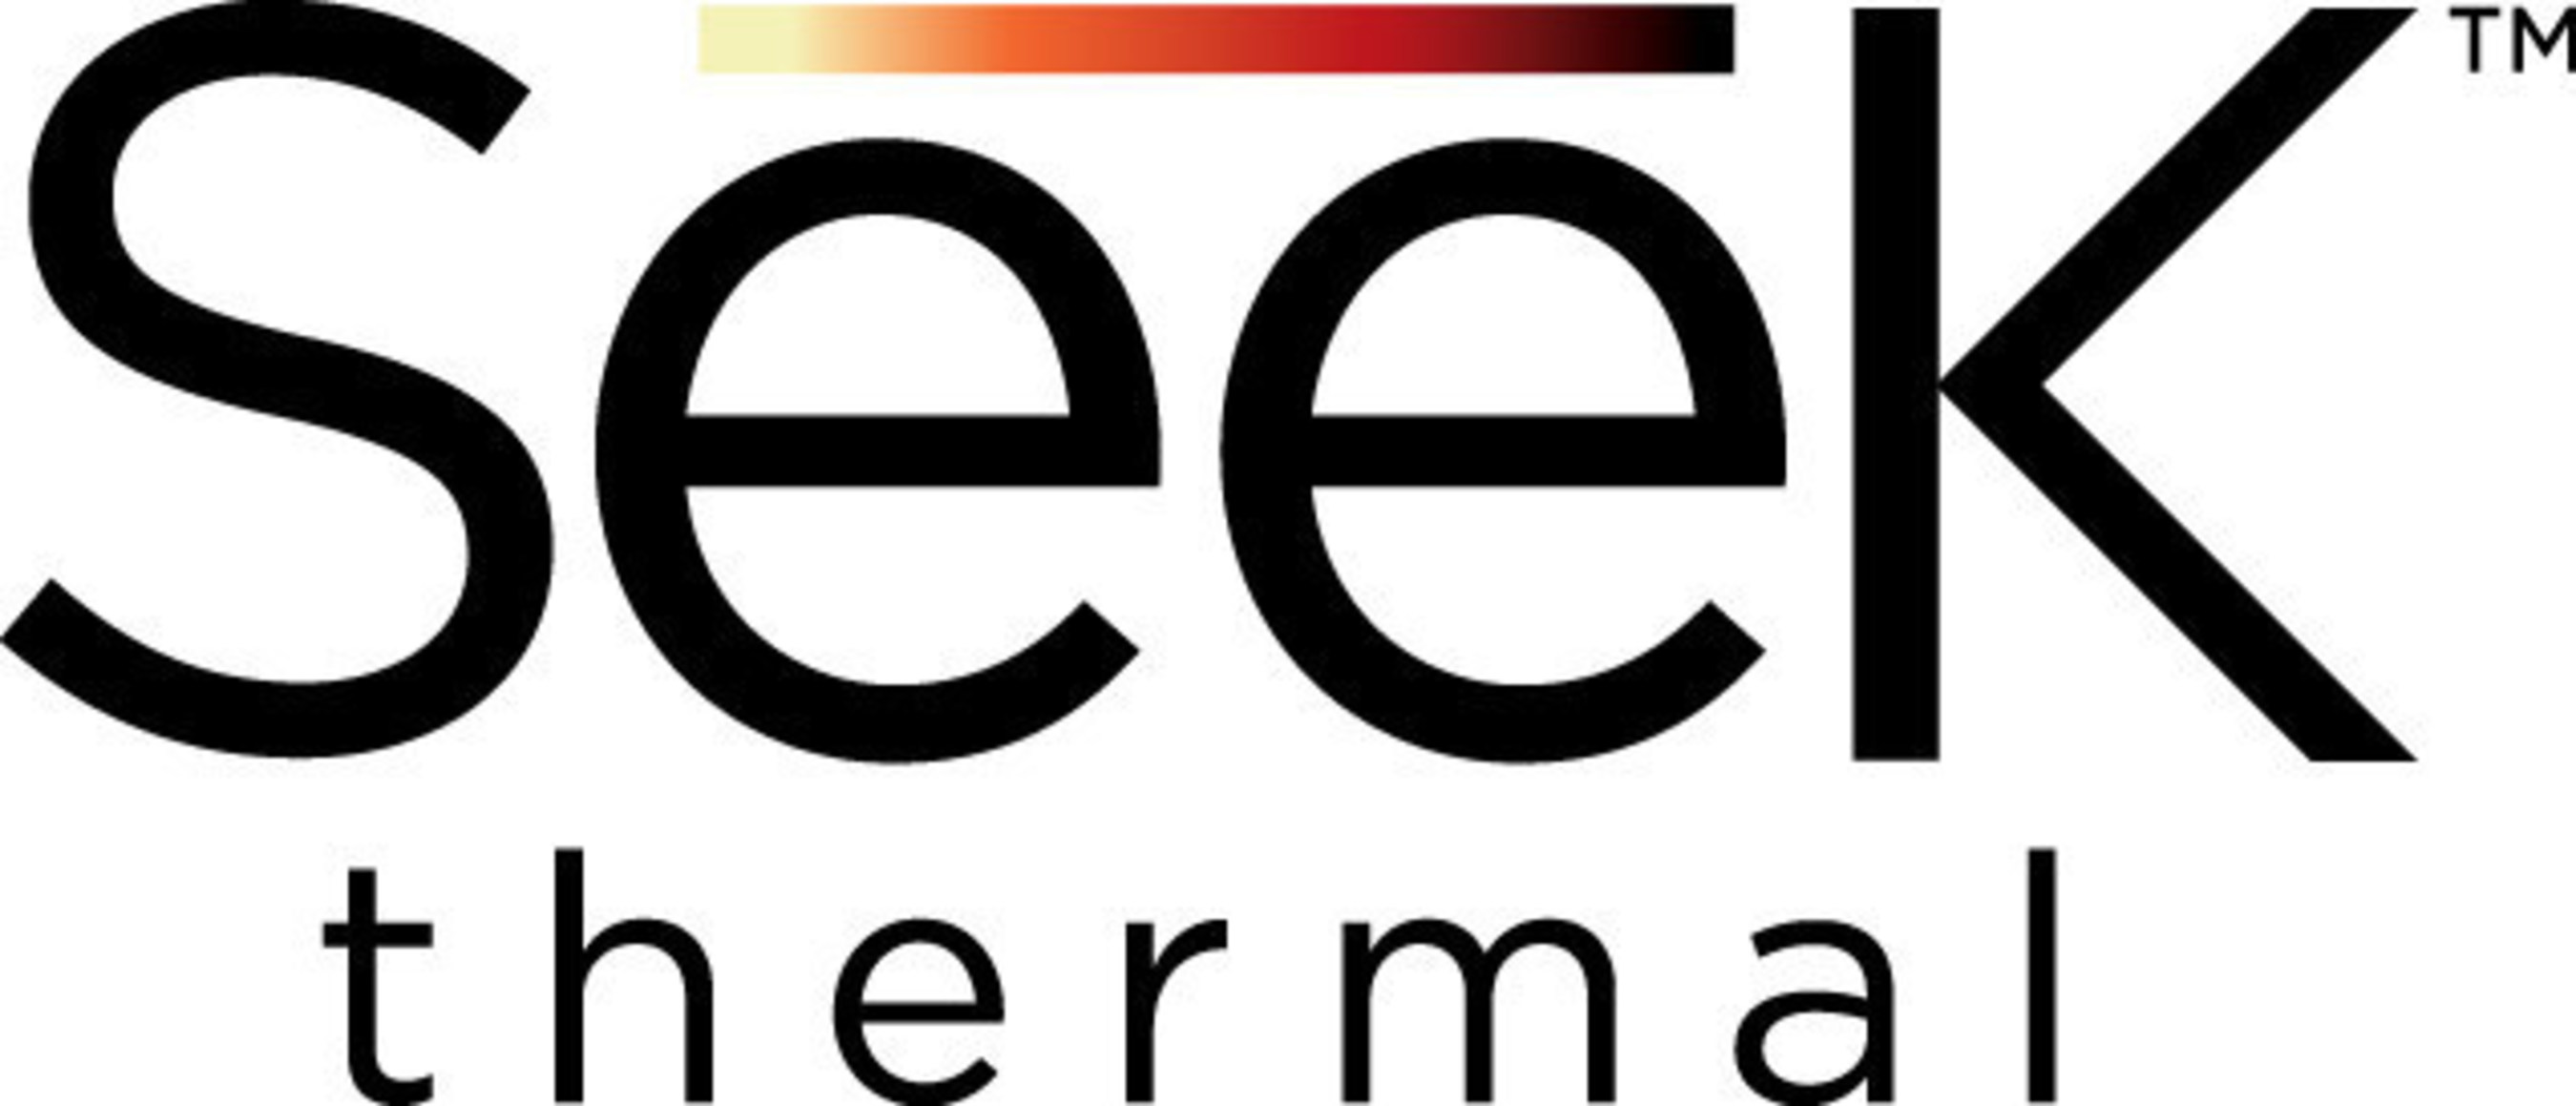 Seek Thermal logo